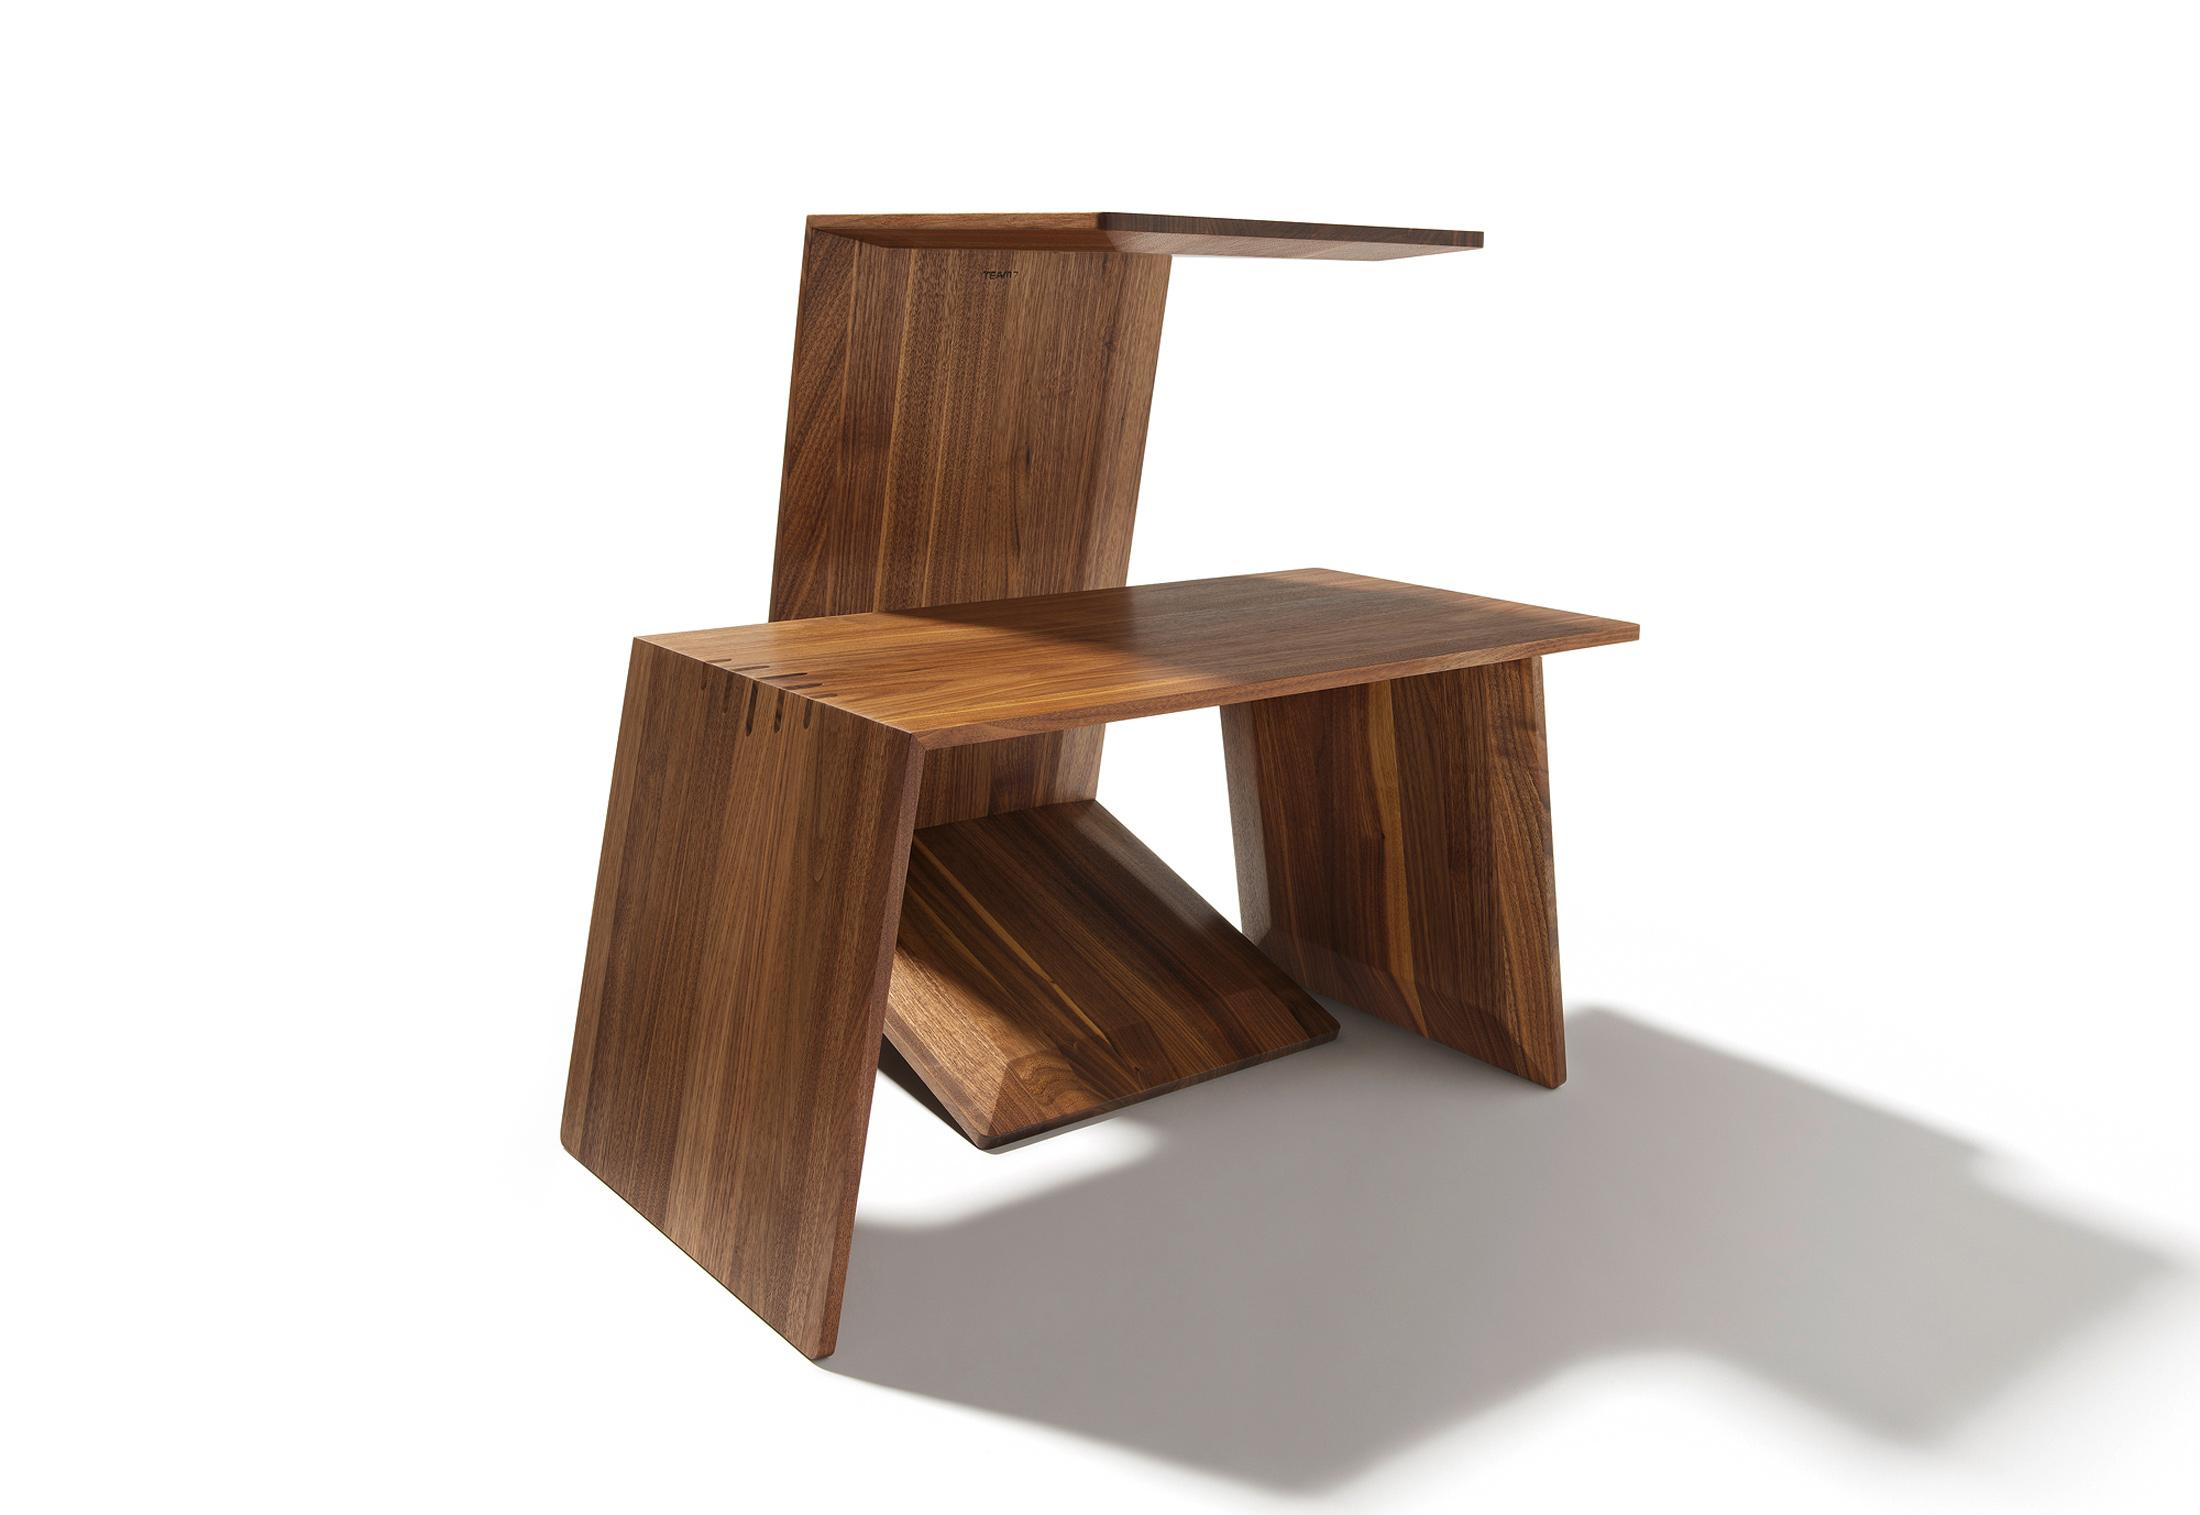 team 7 girado stuhl preis affordable filigno kche with. Black Bedroom Furniture Sets. Home Design Ideas